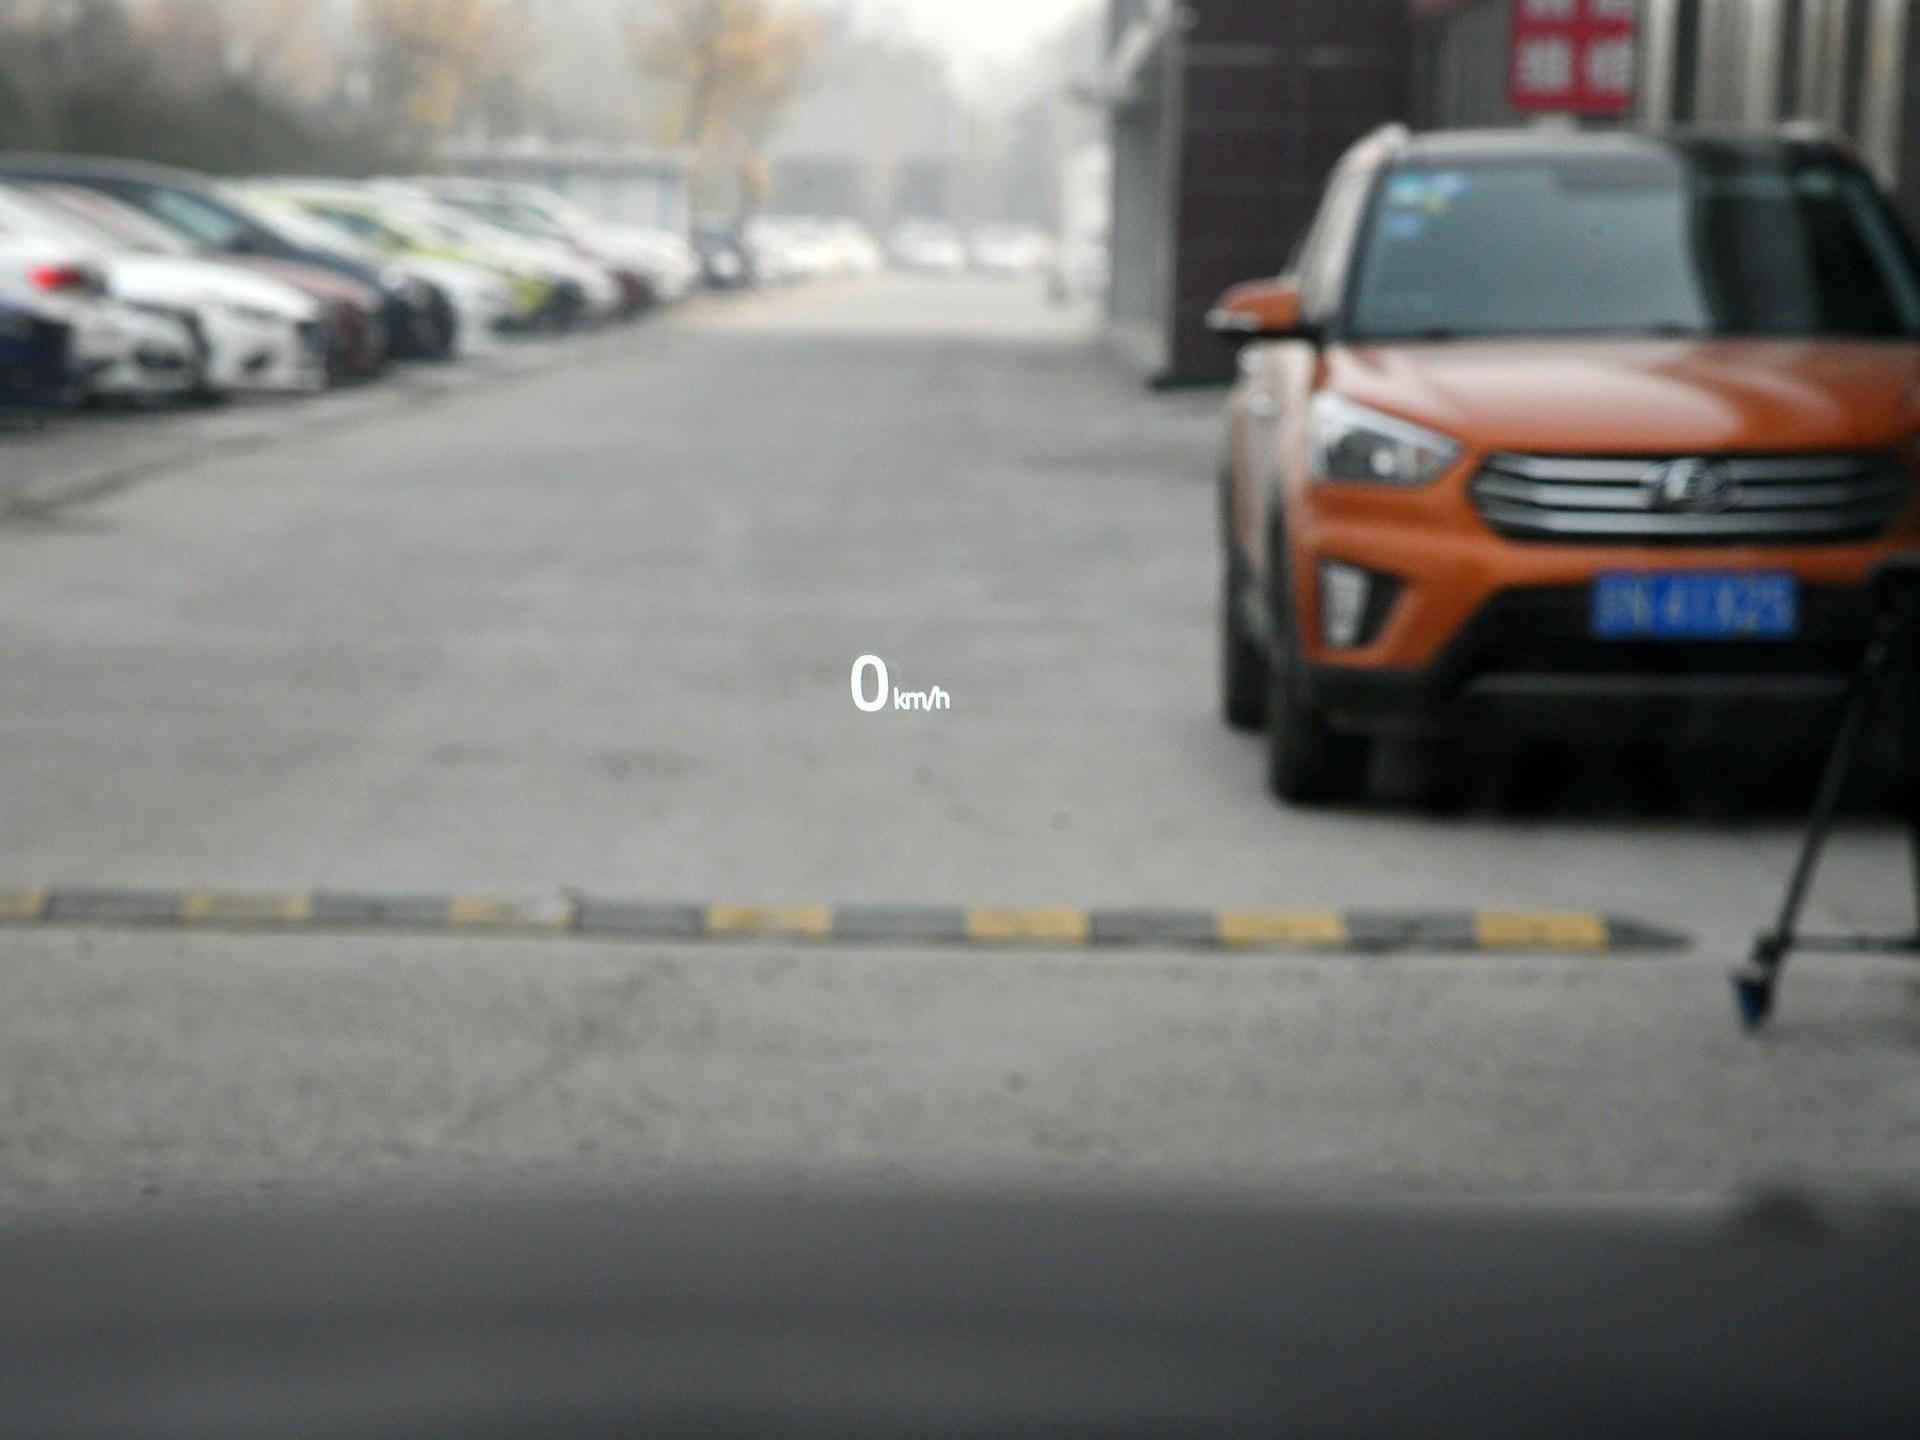 http://cools.qctt.cn/1544174165219.jpeg?imageMogr2/size-limit/1024k!